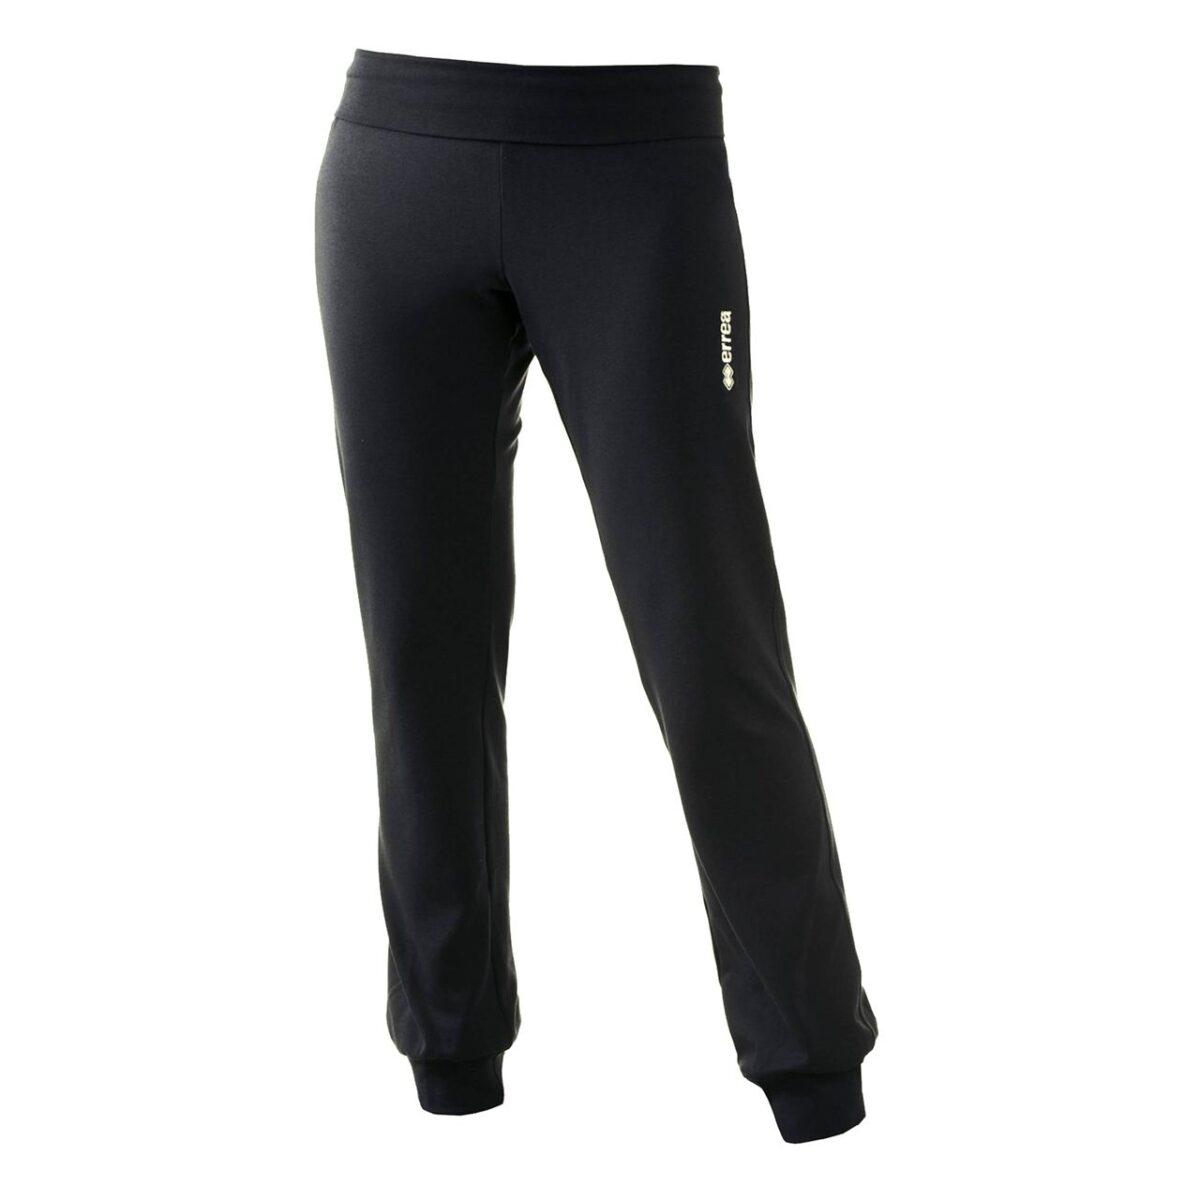 Errea Rocks 3.0 Ladies Trousers D375